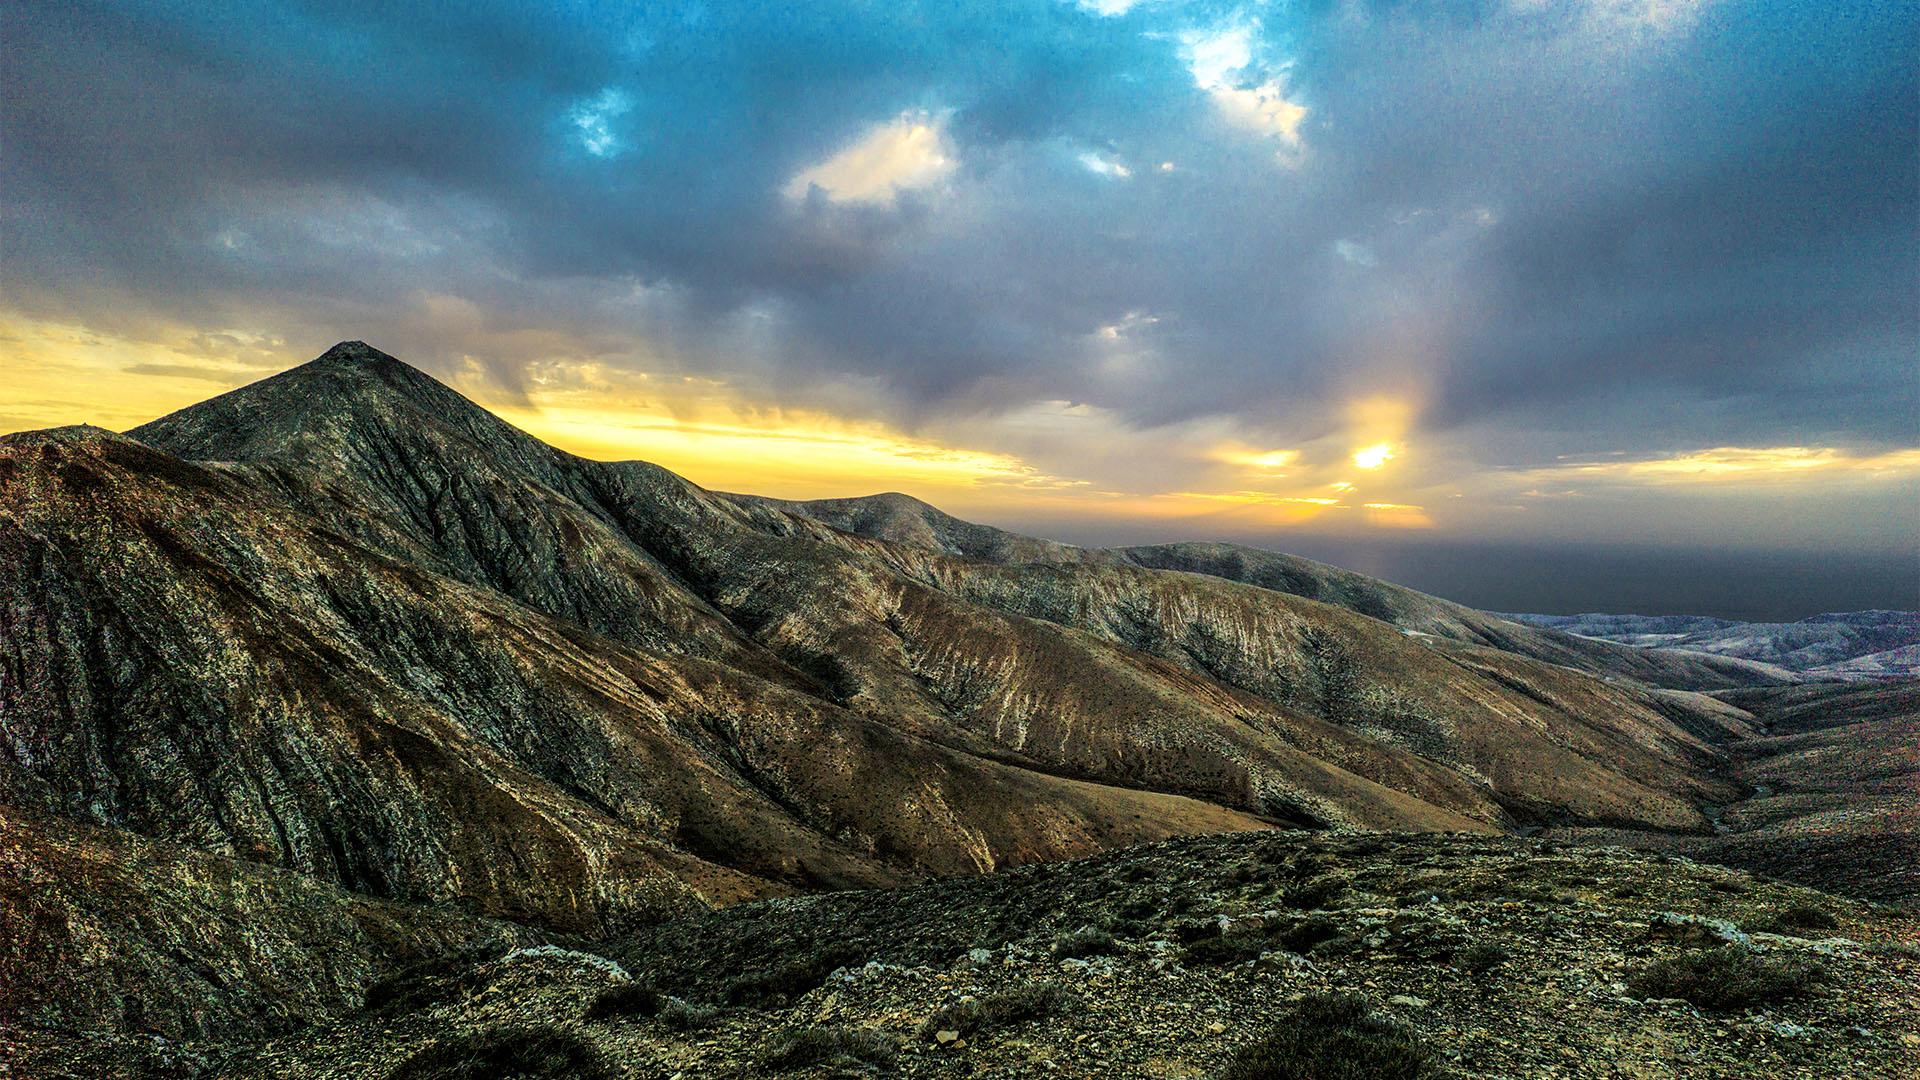 Fuerteventura Inselrundfahrt Zentralmassiv – Mirador de Pajara Sicasumbre.